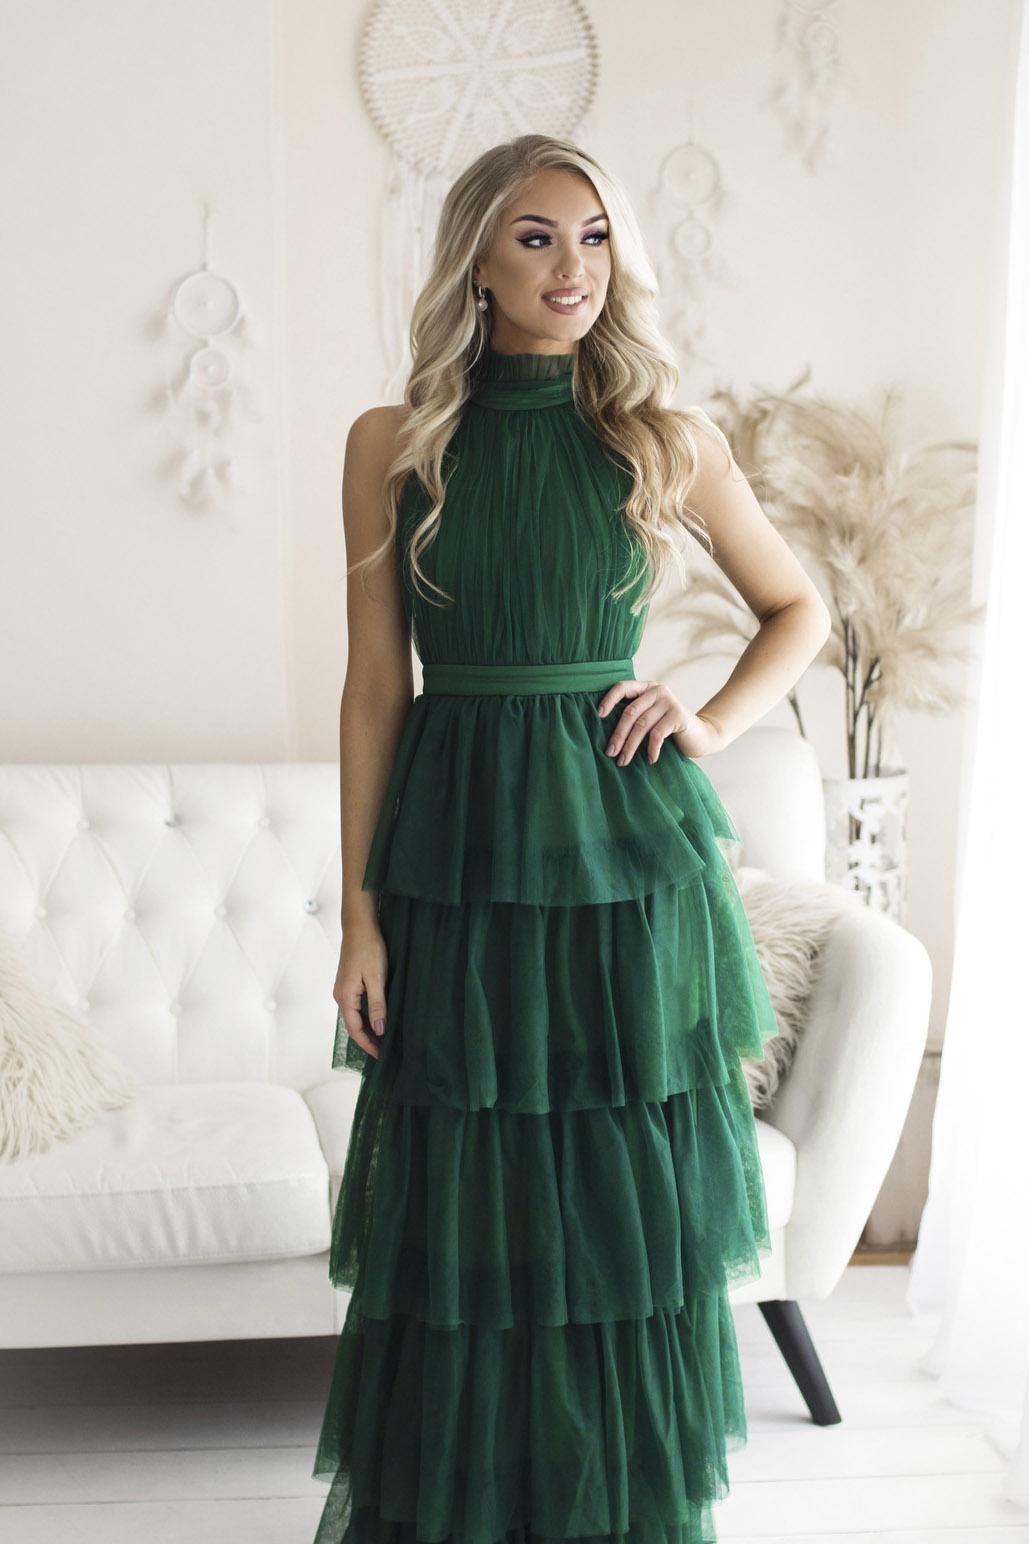 SENAT VENUS roheline kleit